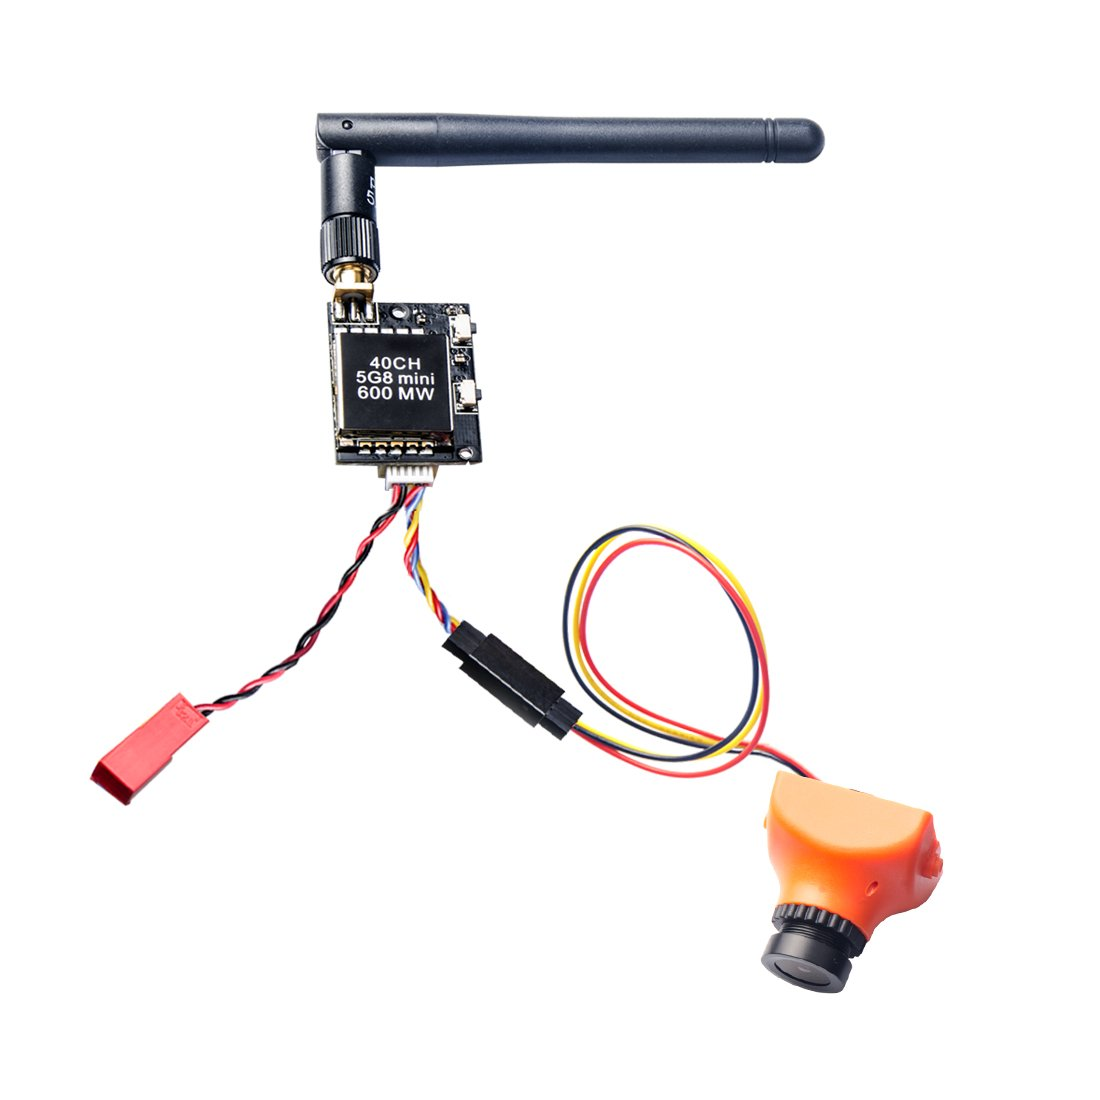 AKK Transmitter Picture Quality Multicopter